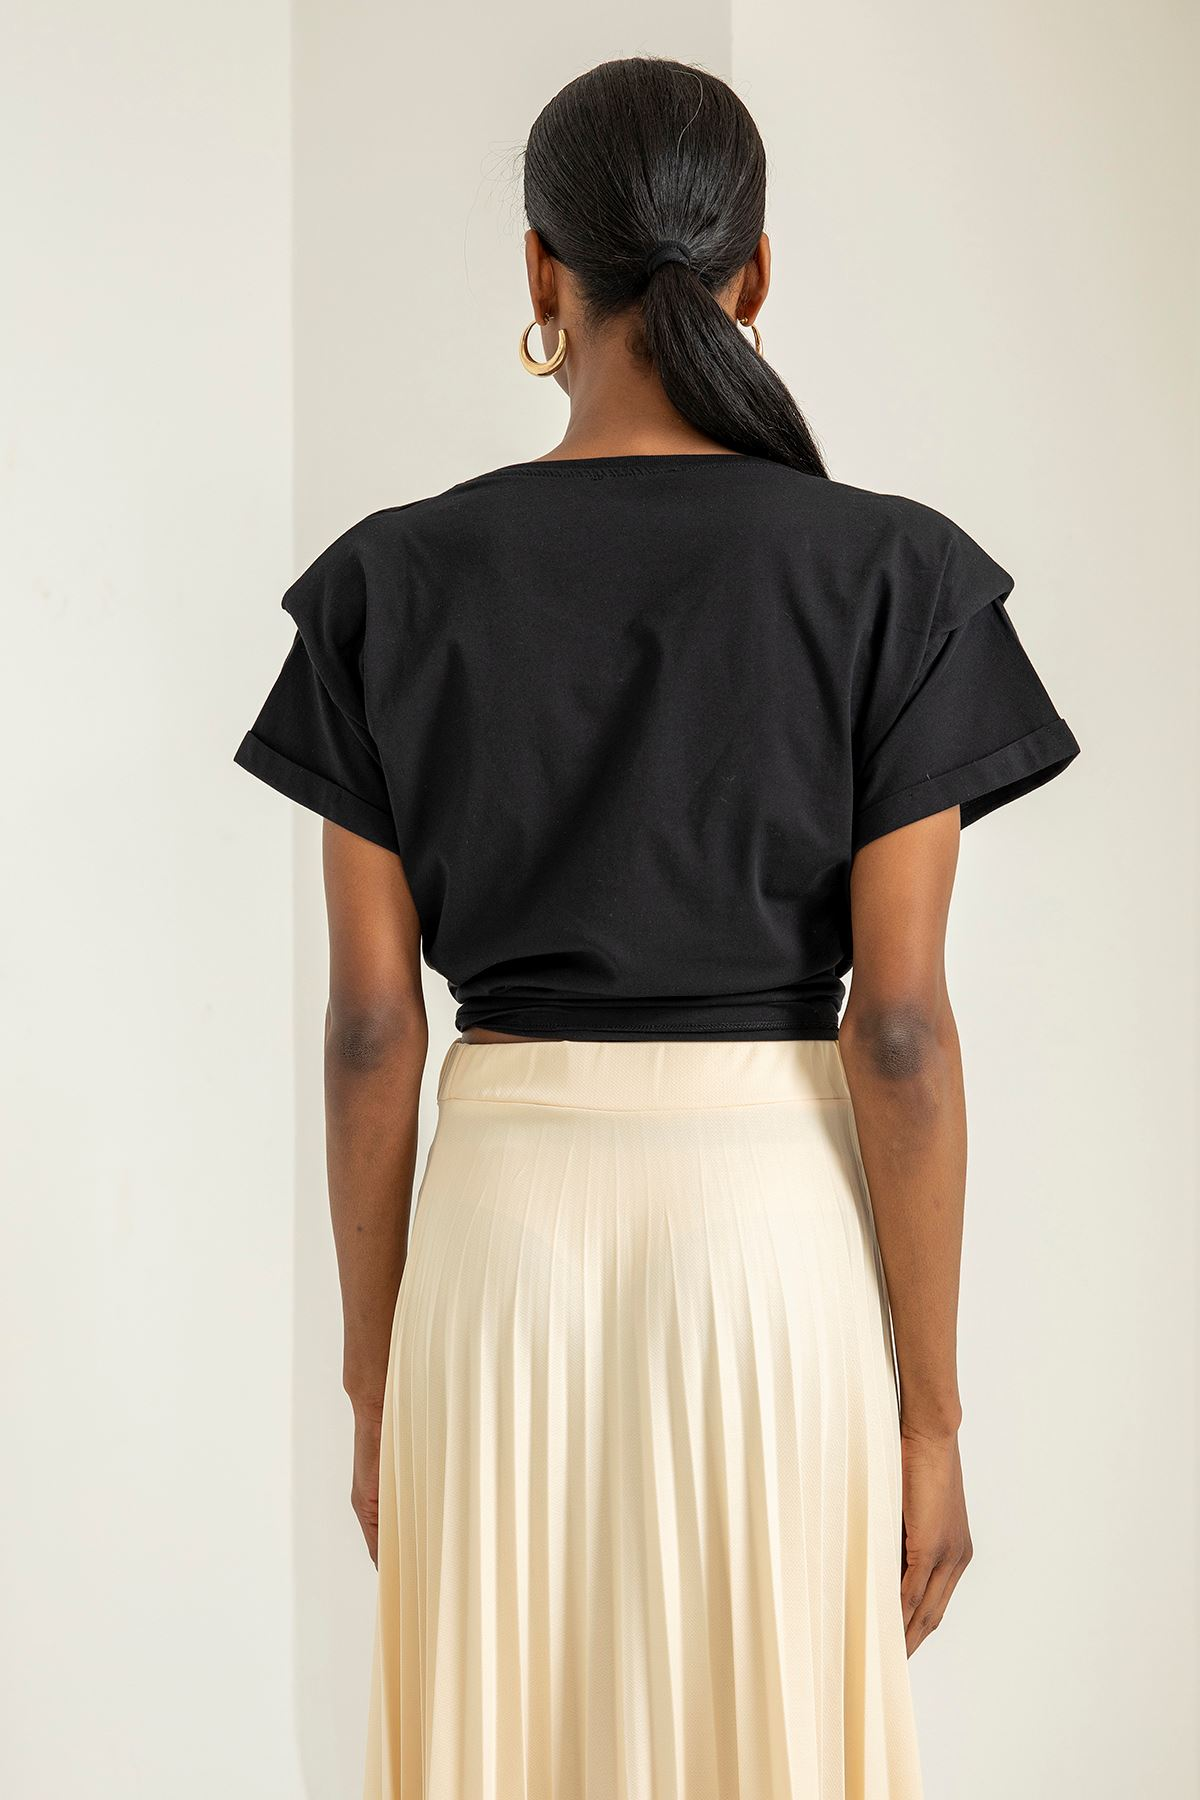 Vatkalı Kısa Kol T-shirt-Siyah